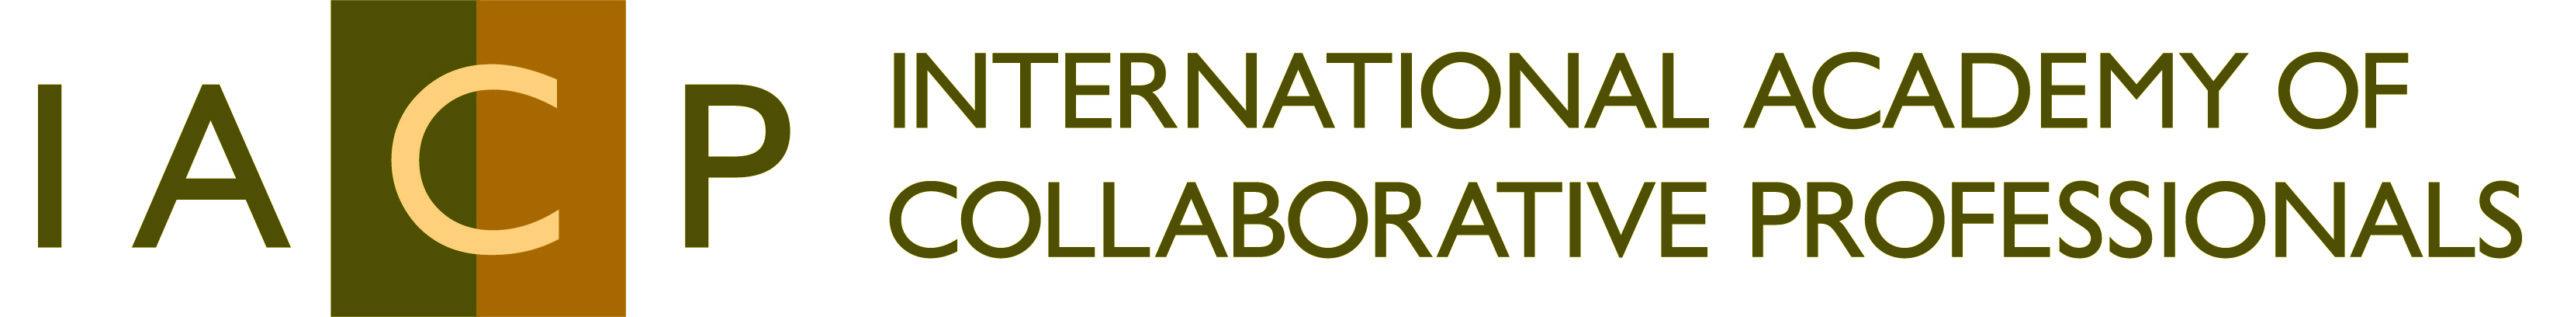 IACP-logo-forum